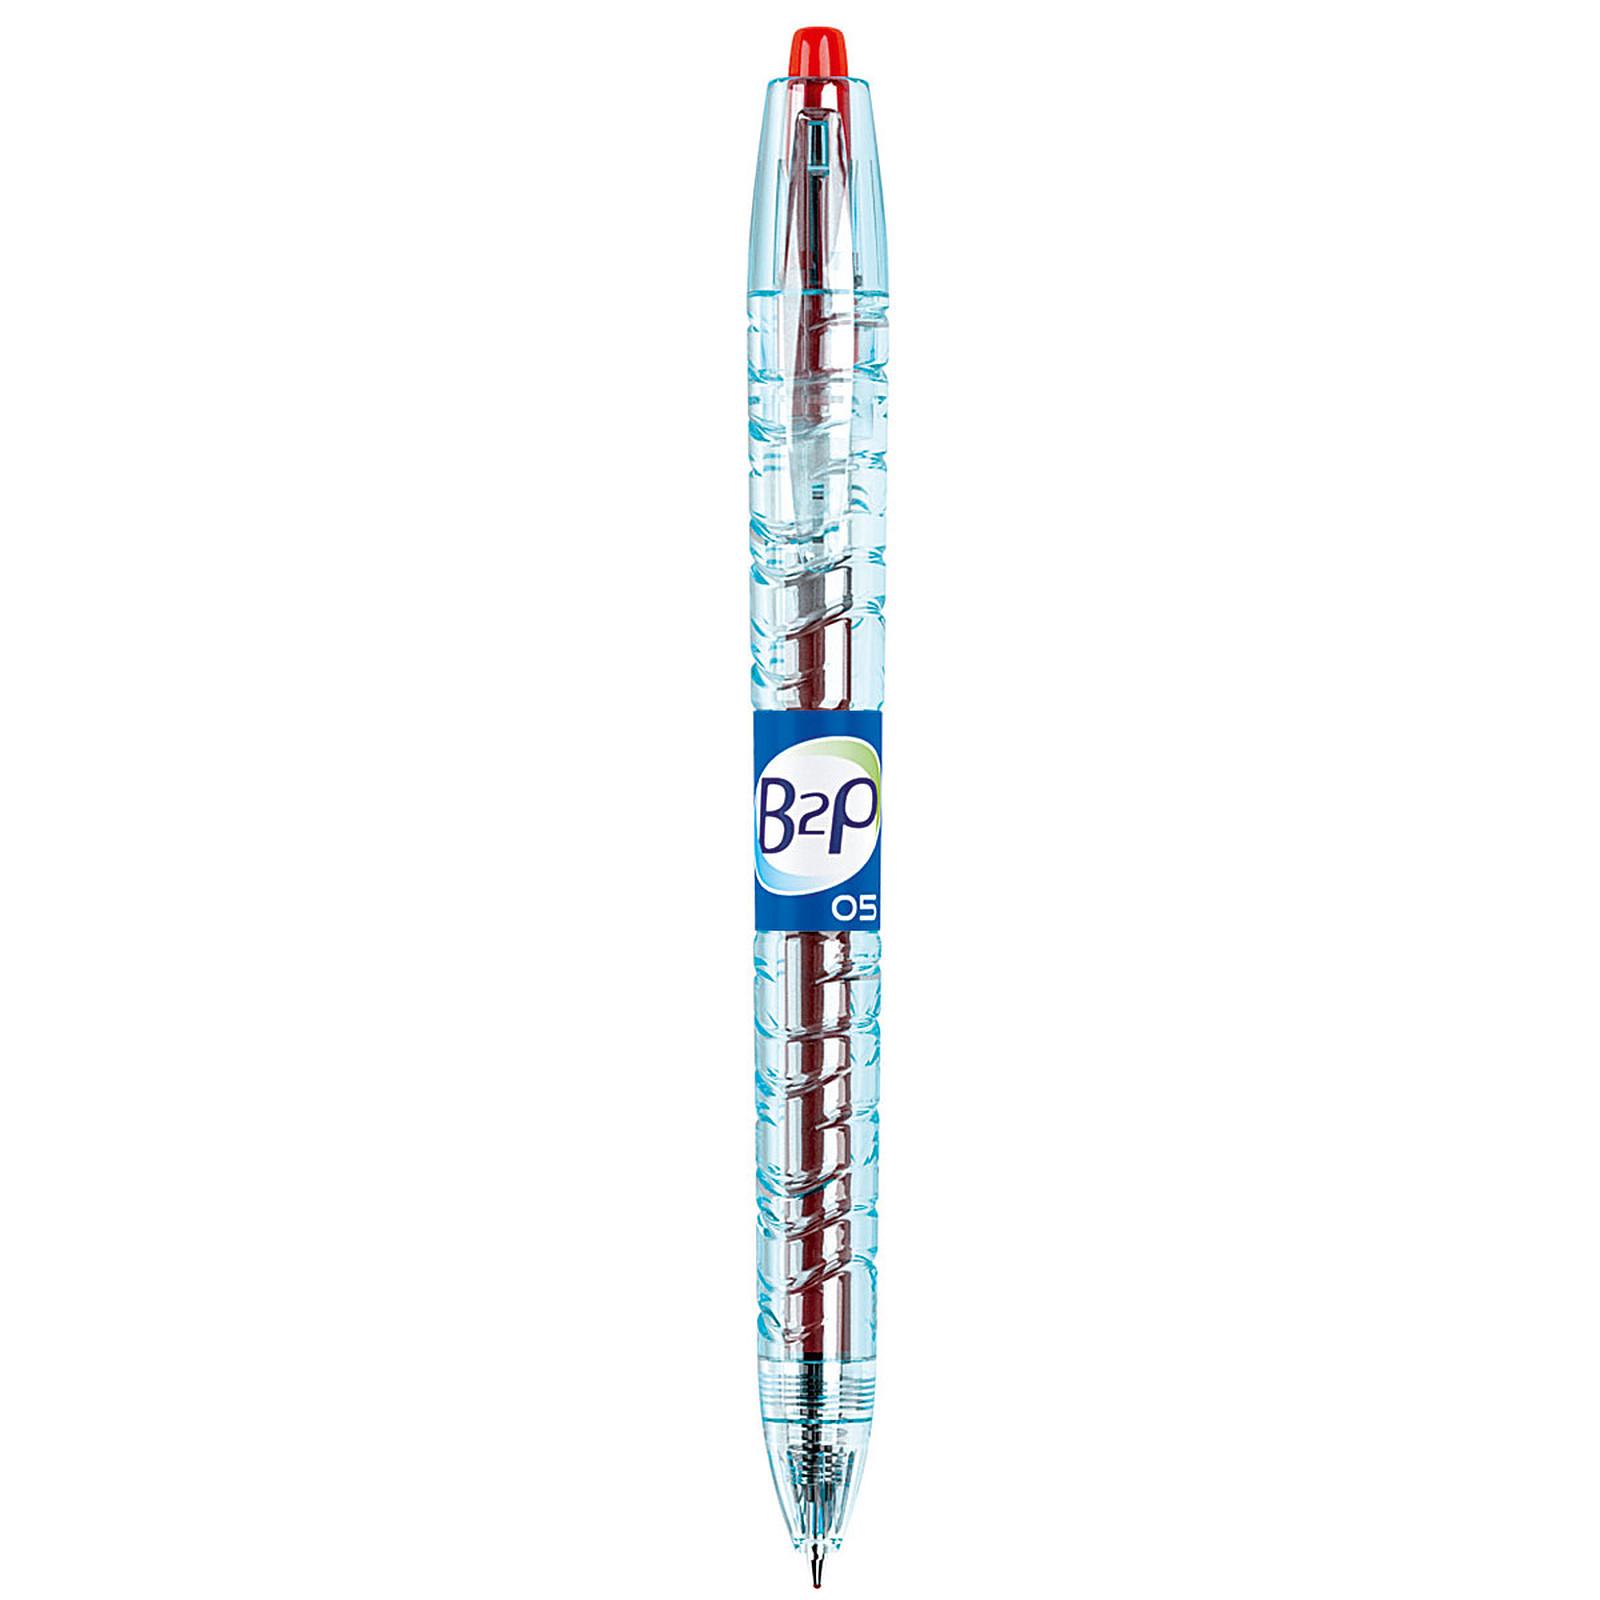 PILOT Begreen B2P rouge pointe 0,5mm